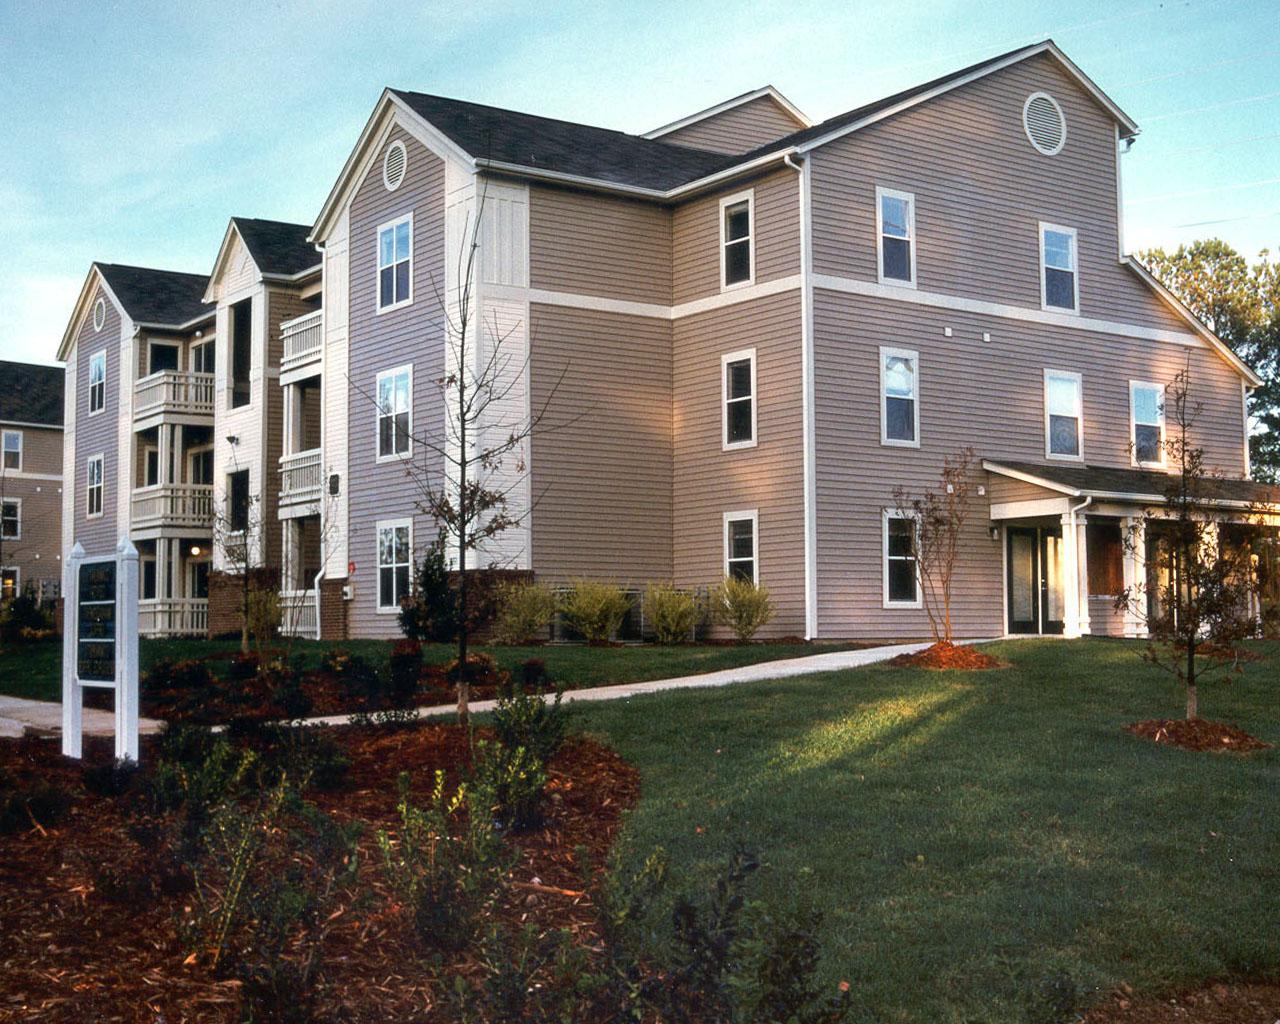 Dobbins Hill Apartments in Chapel Hill, NC